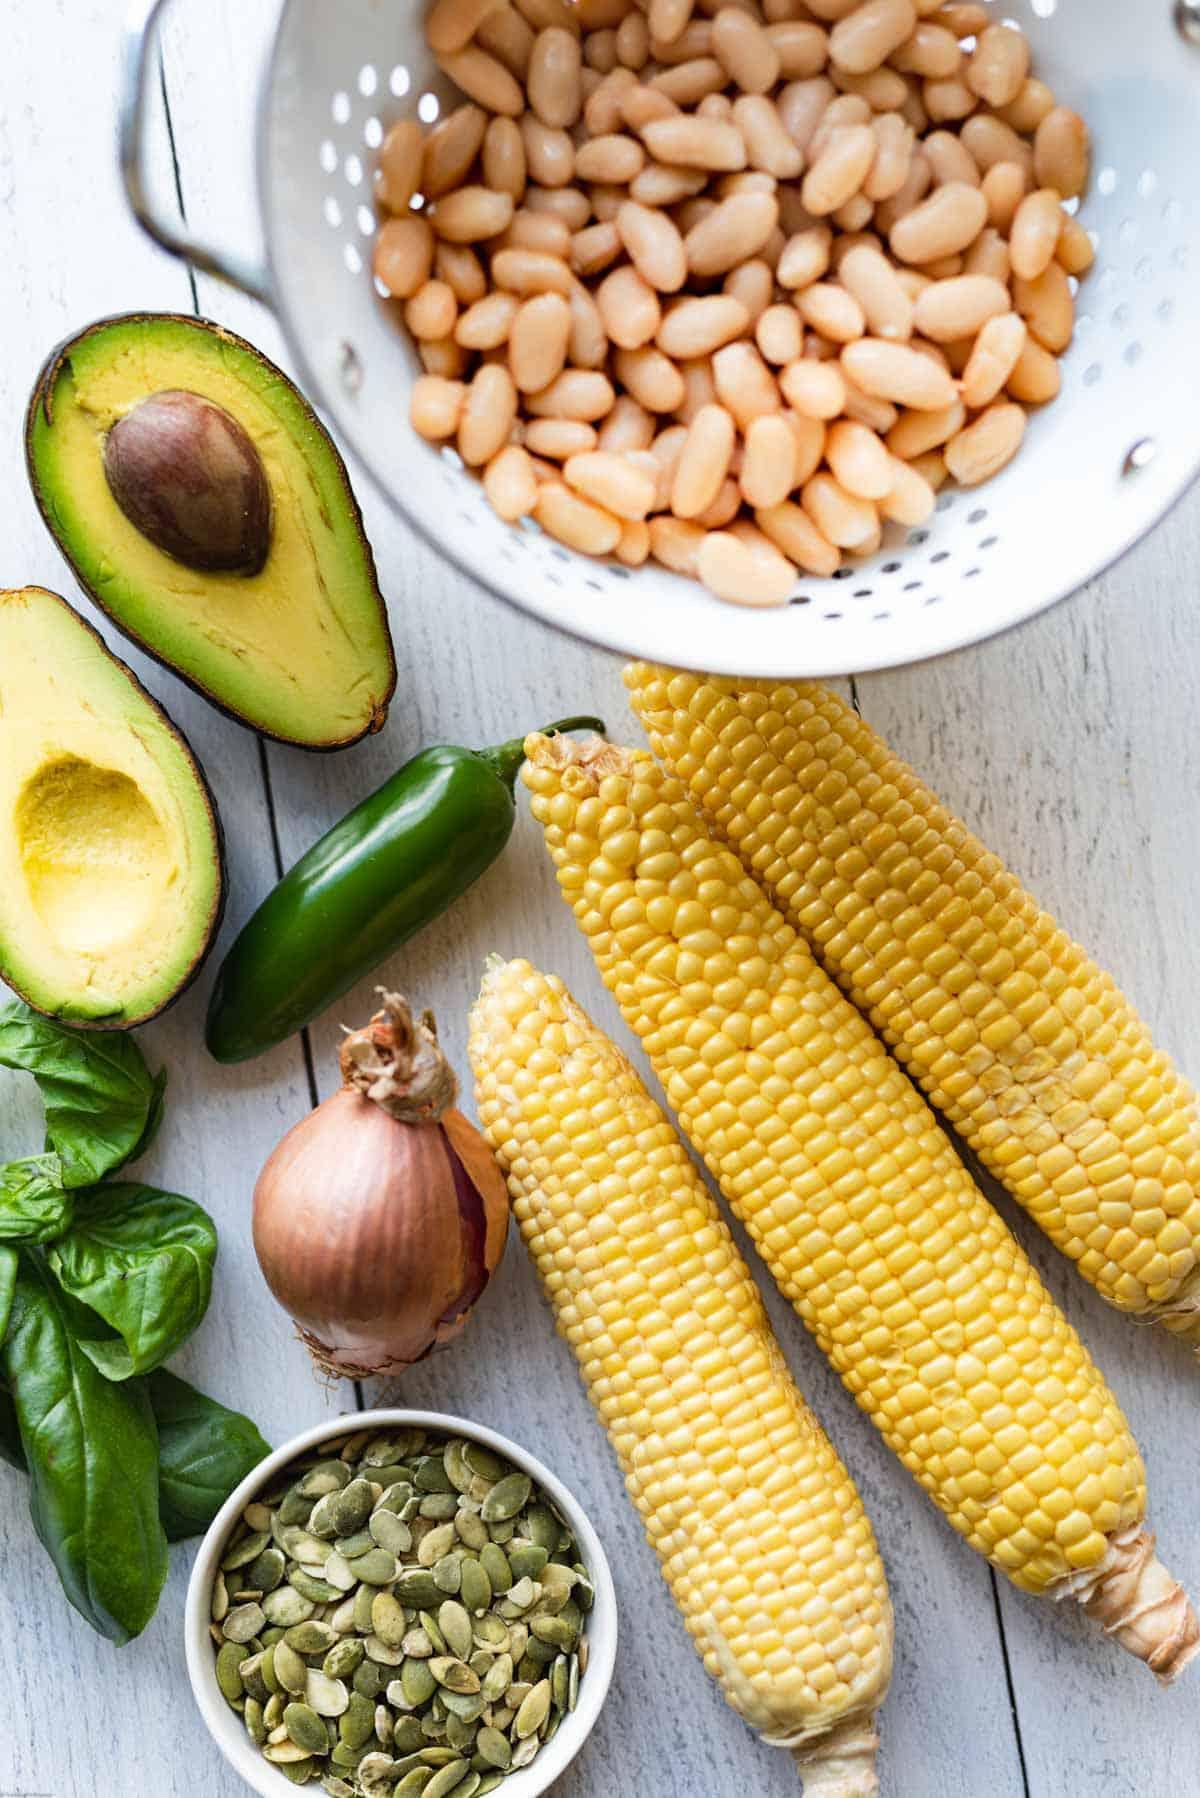 White beans, corn, shallot, pepitas, jalapeno, avocado and basil for High-Protein Bean & Corn Salad.